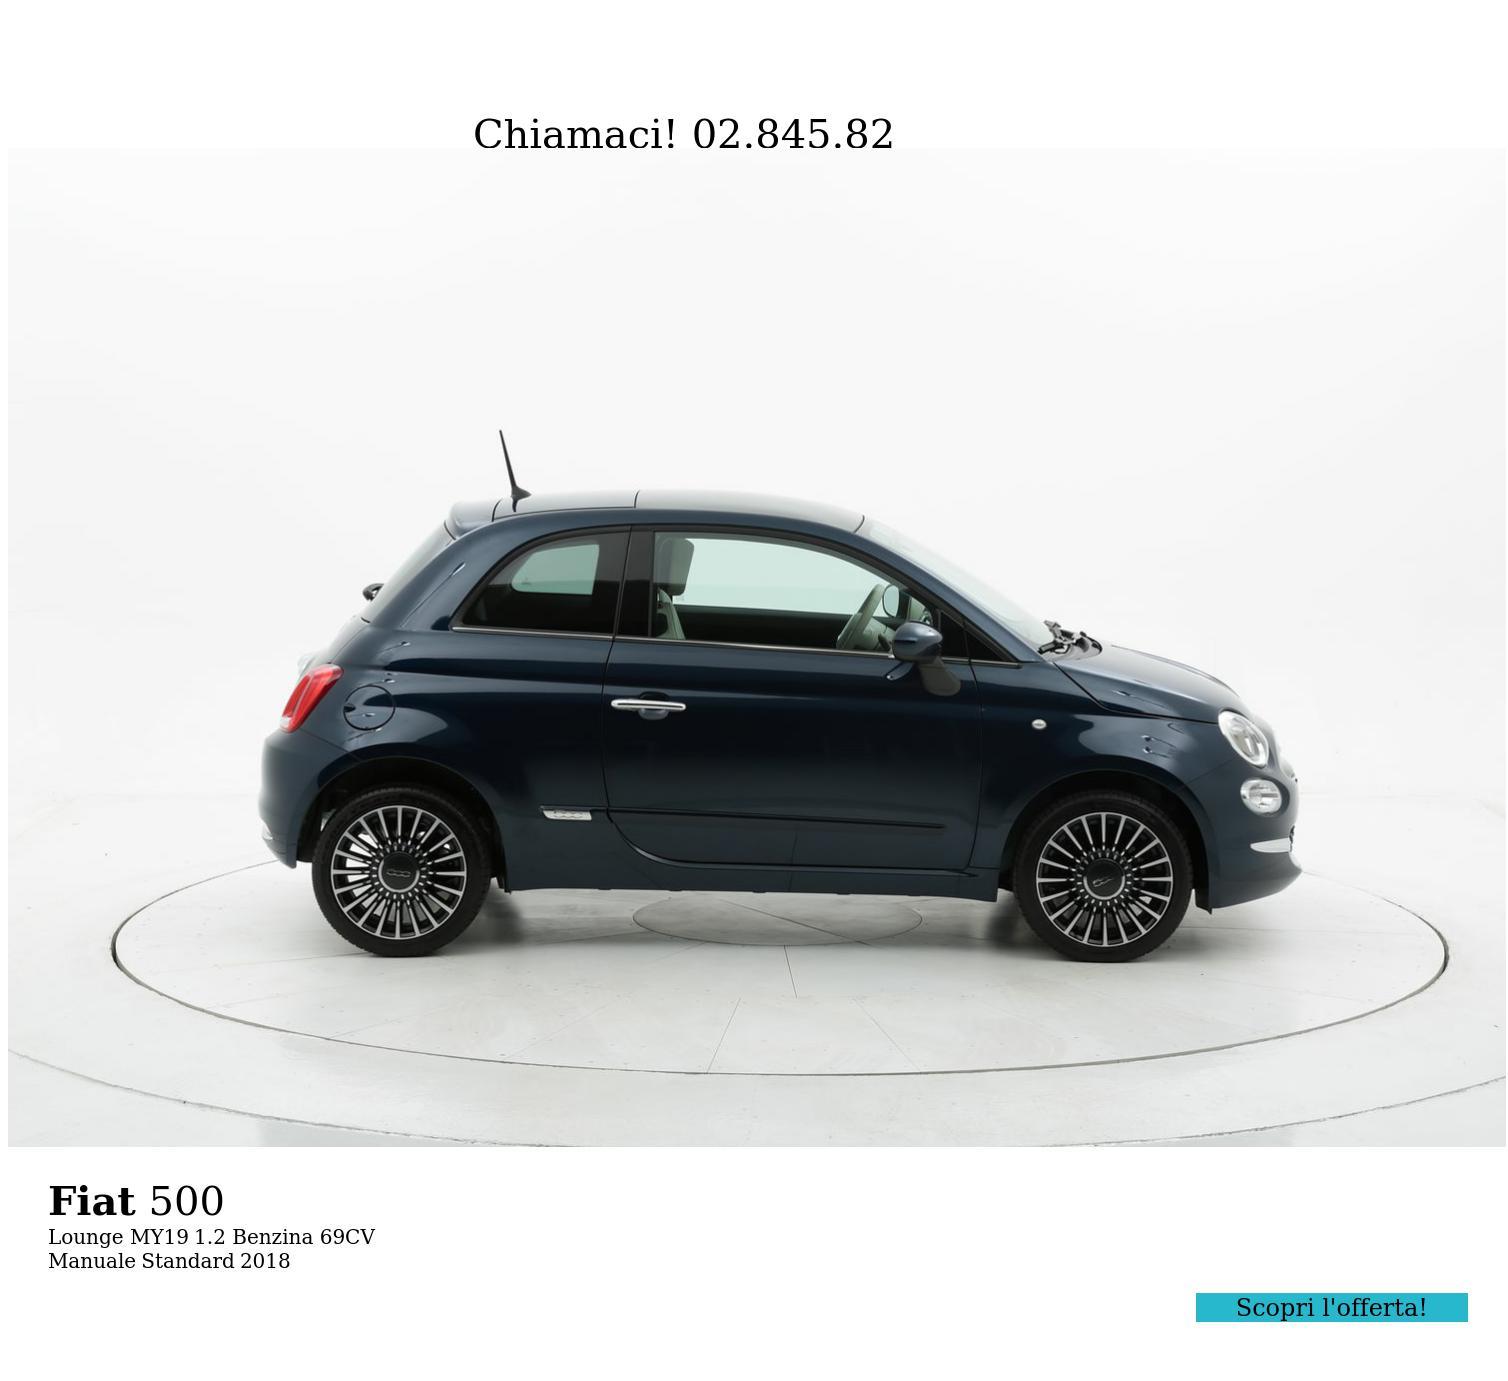 Fiat 500 Lounge MY19 km 0 benzina blu | brumbrum